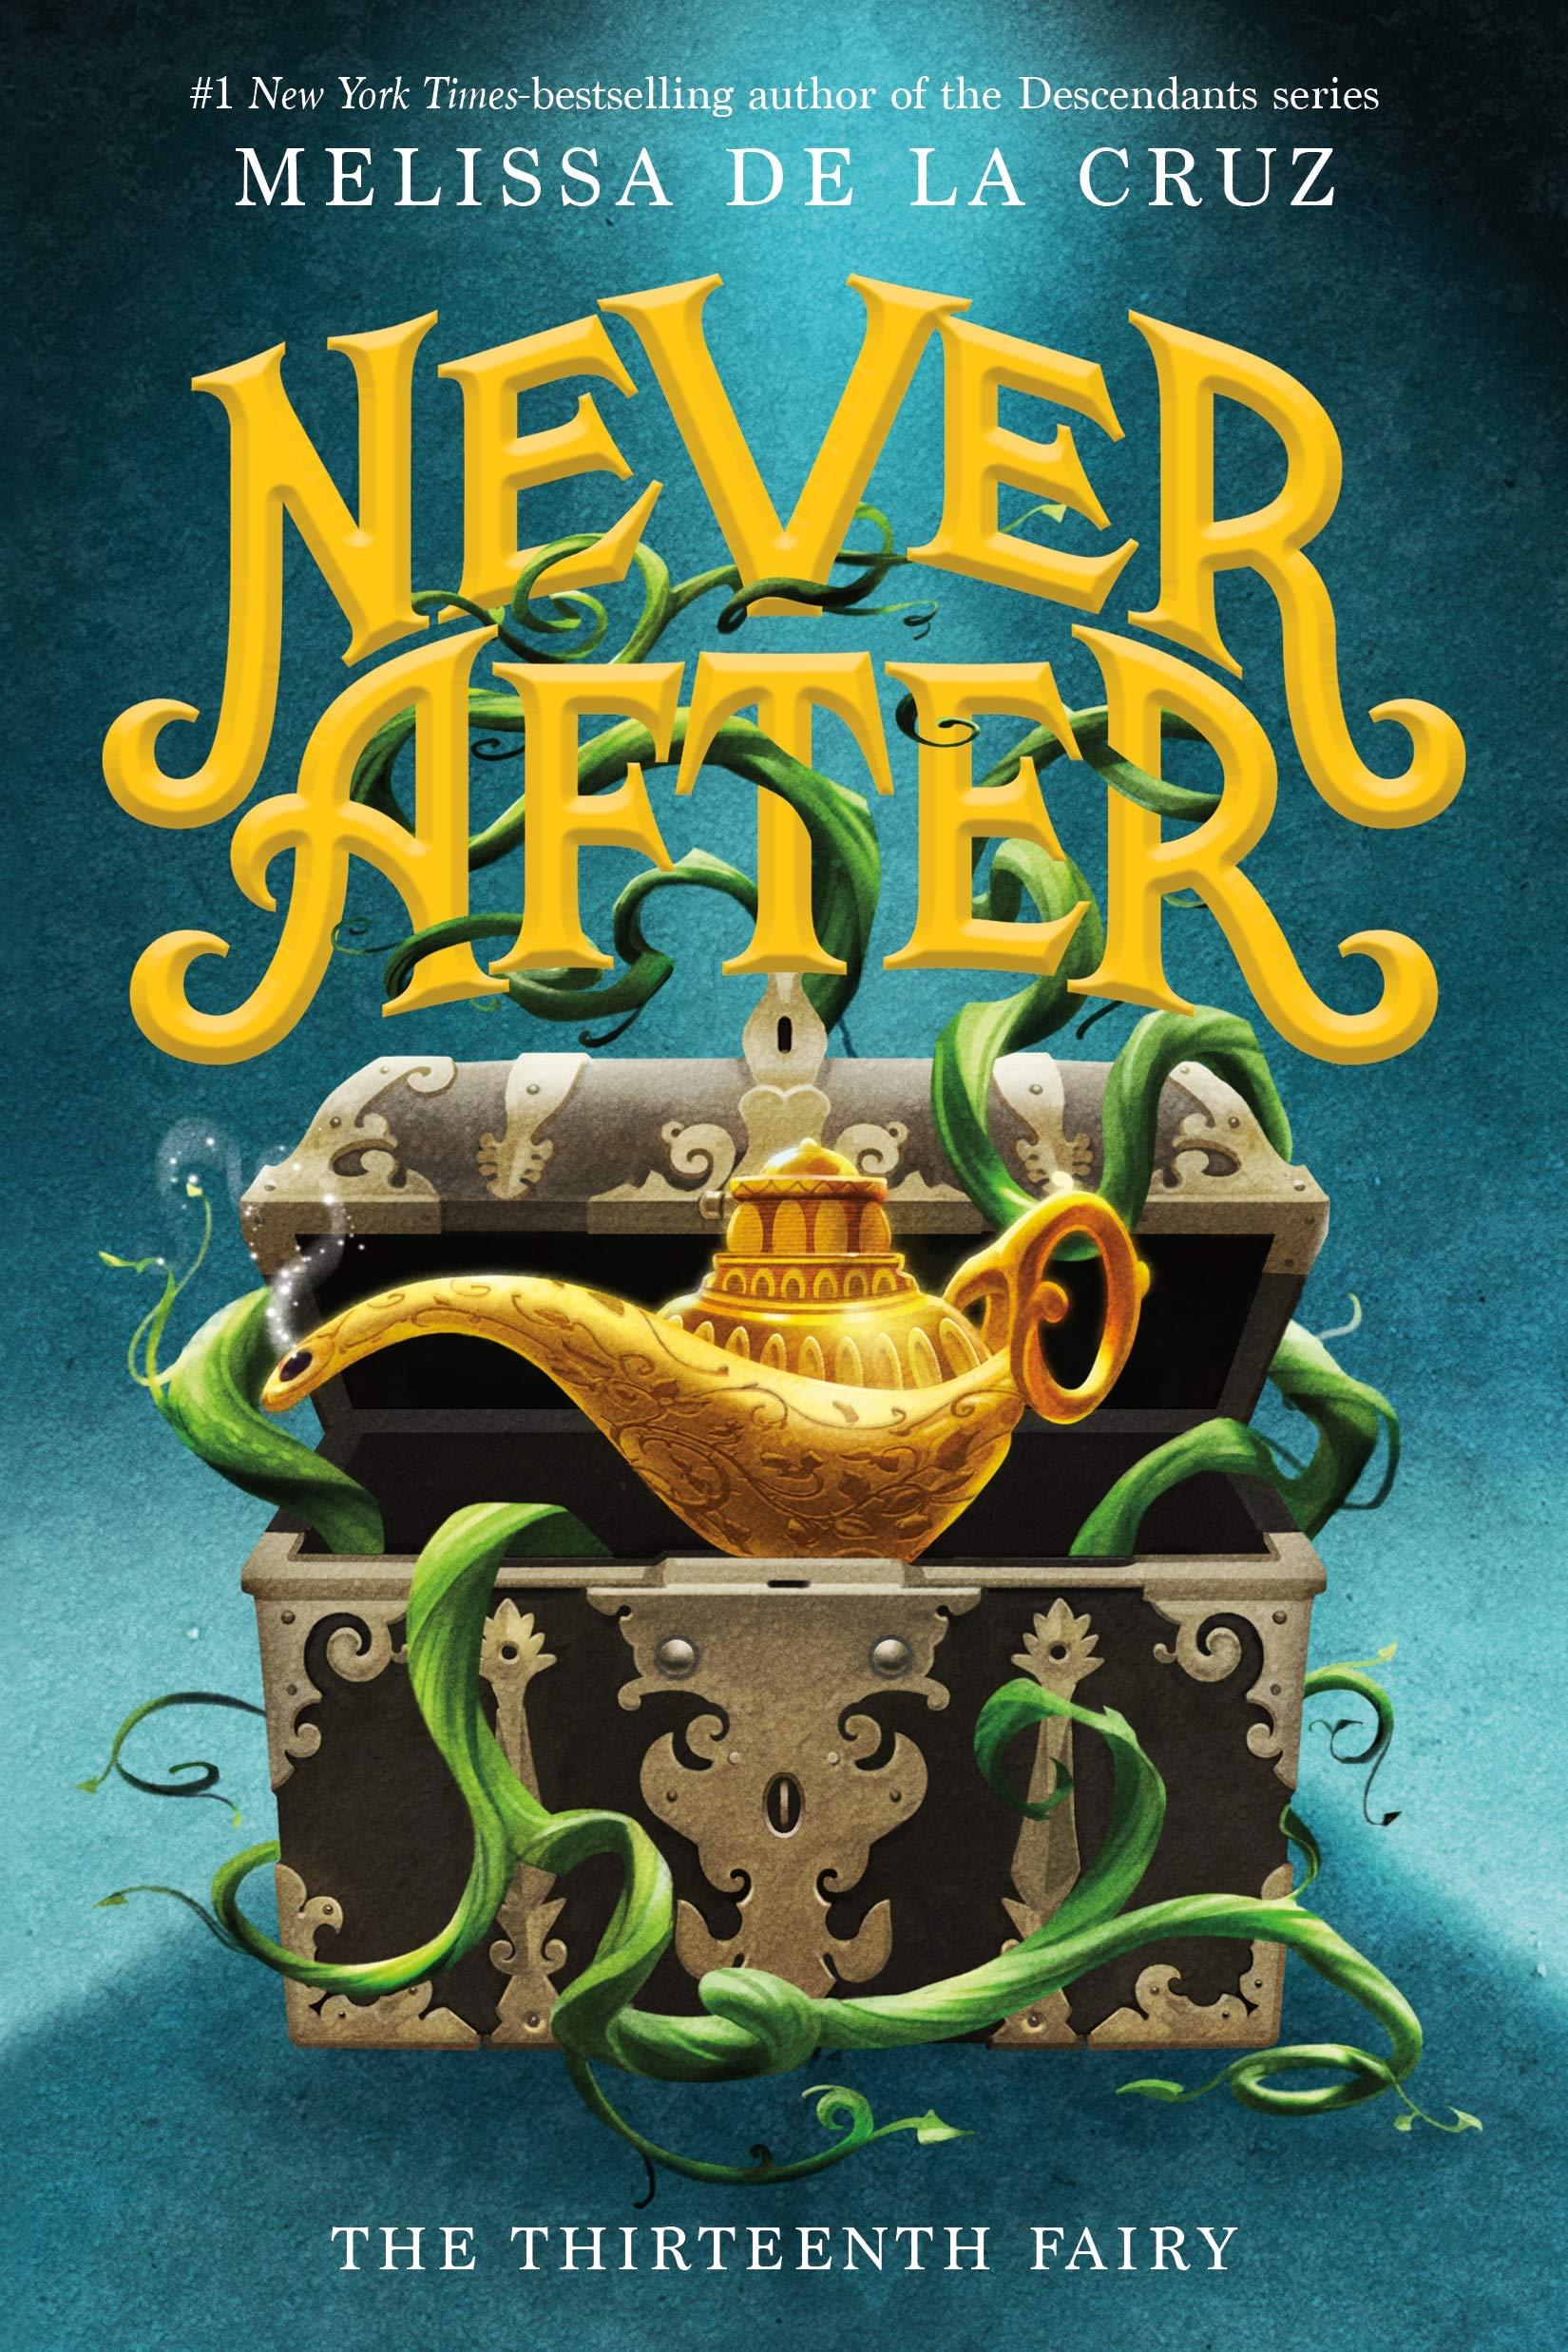 Never After: The Thirteenth Fairy (The Chronicles of Never After, 1): de la  Cruz, Melissa: 9781250311214: Amazon.com: Books